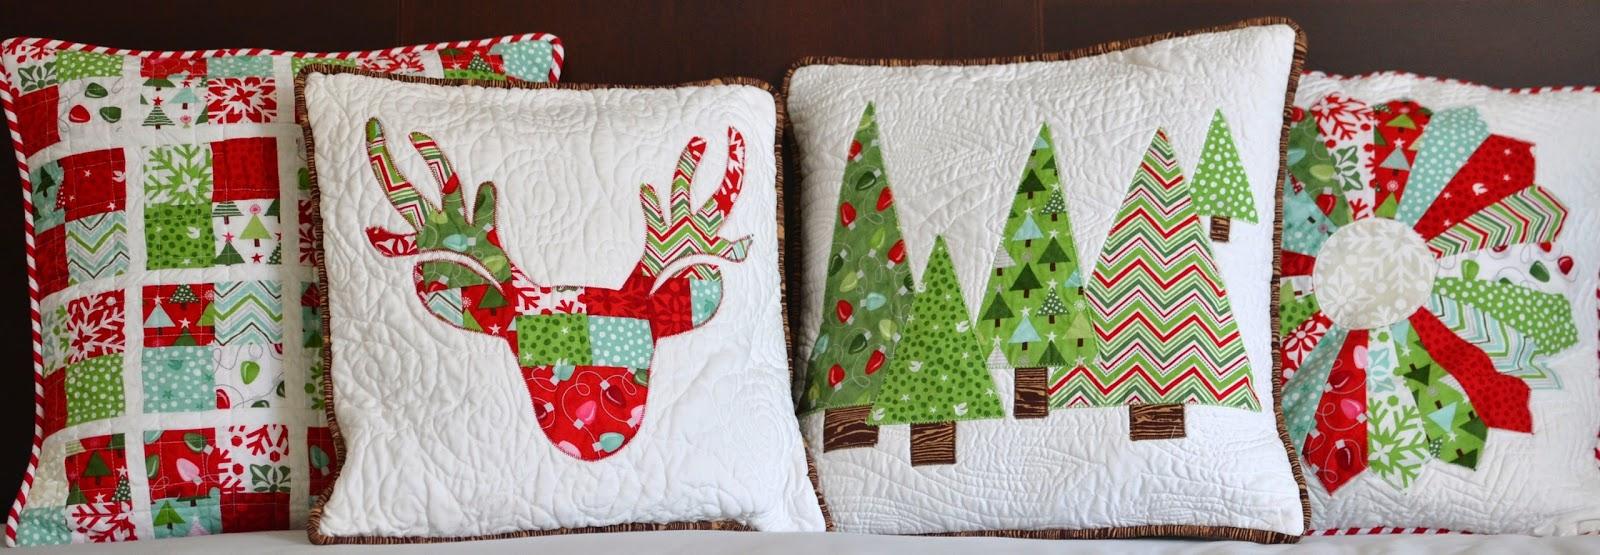 Cut Sew Press Love Christmas Sewing